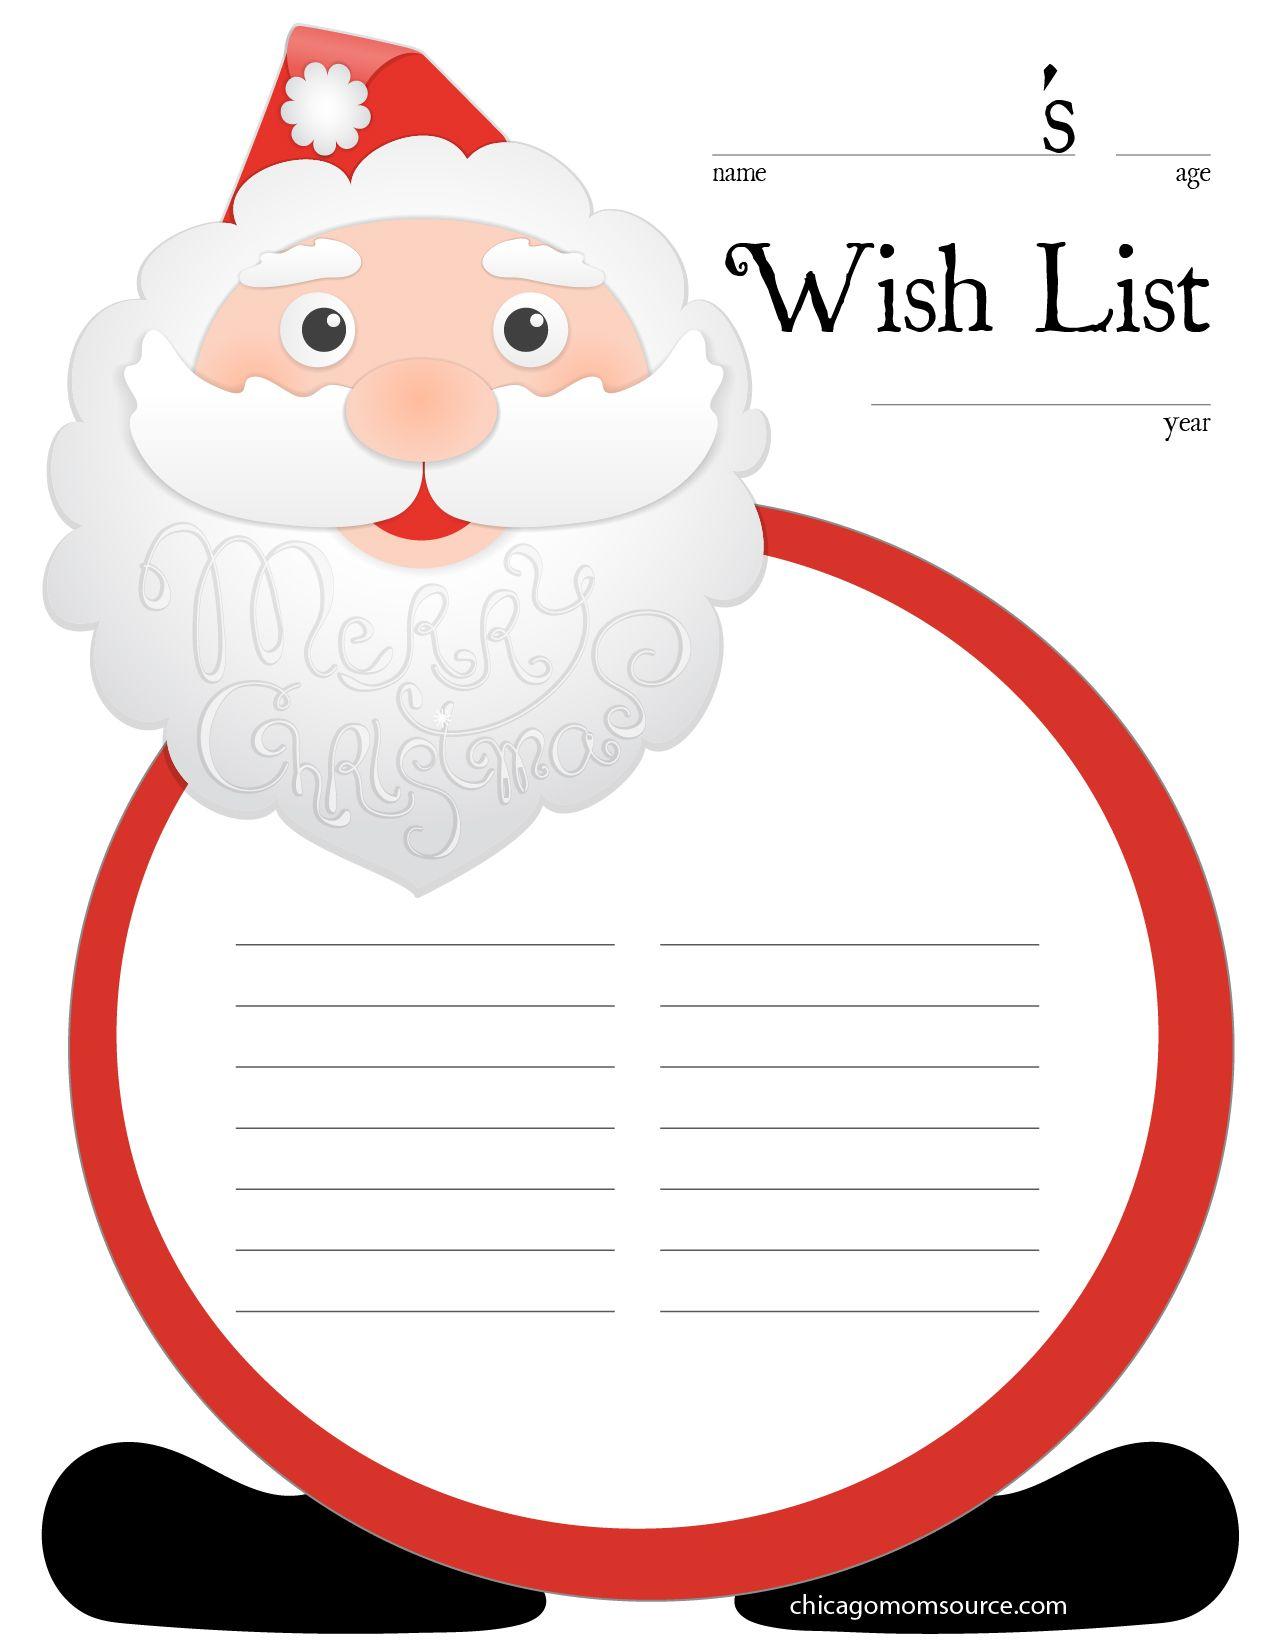 How to write a wish list to santa